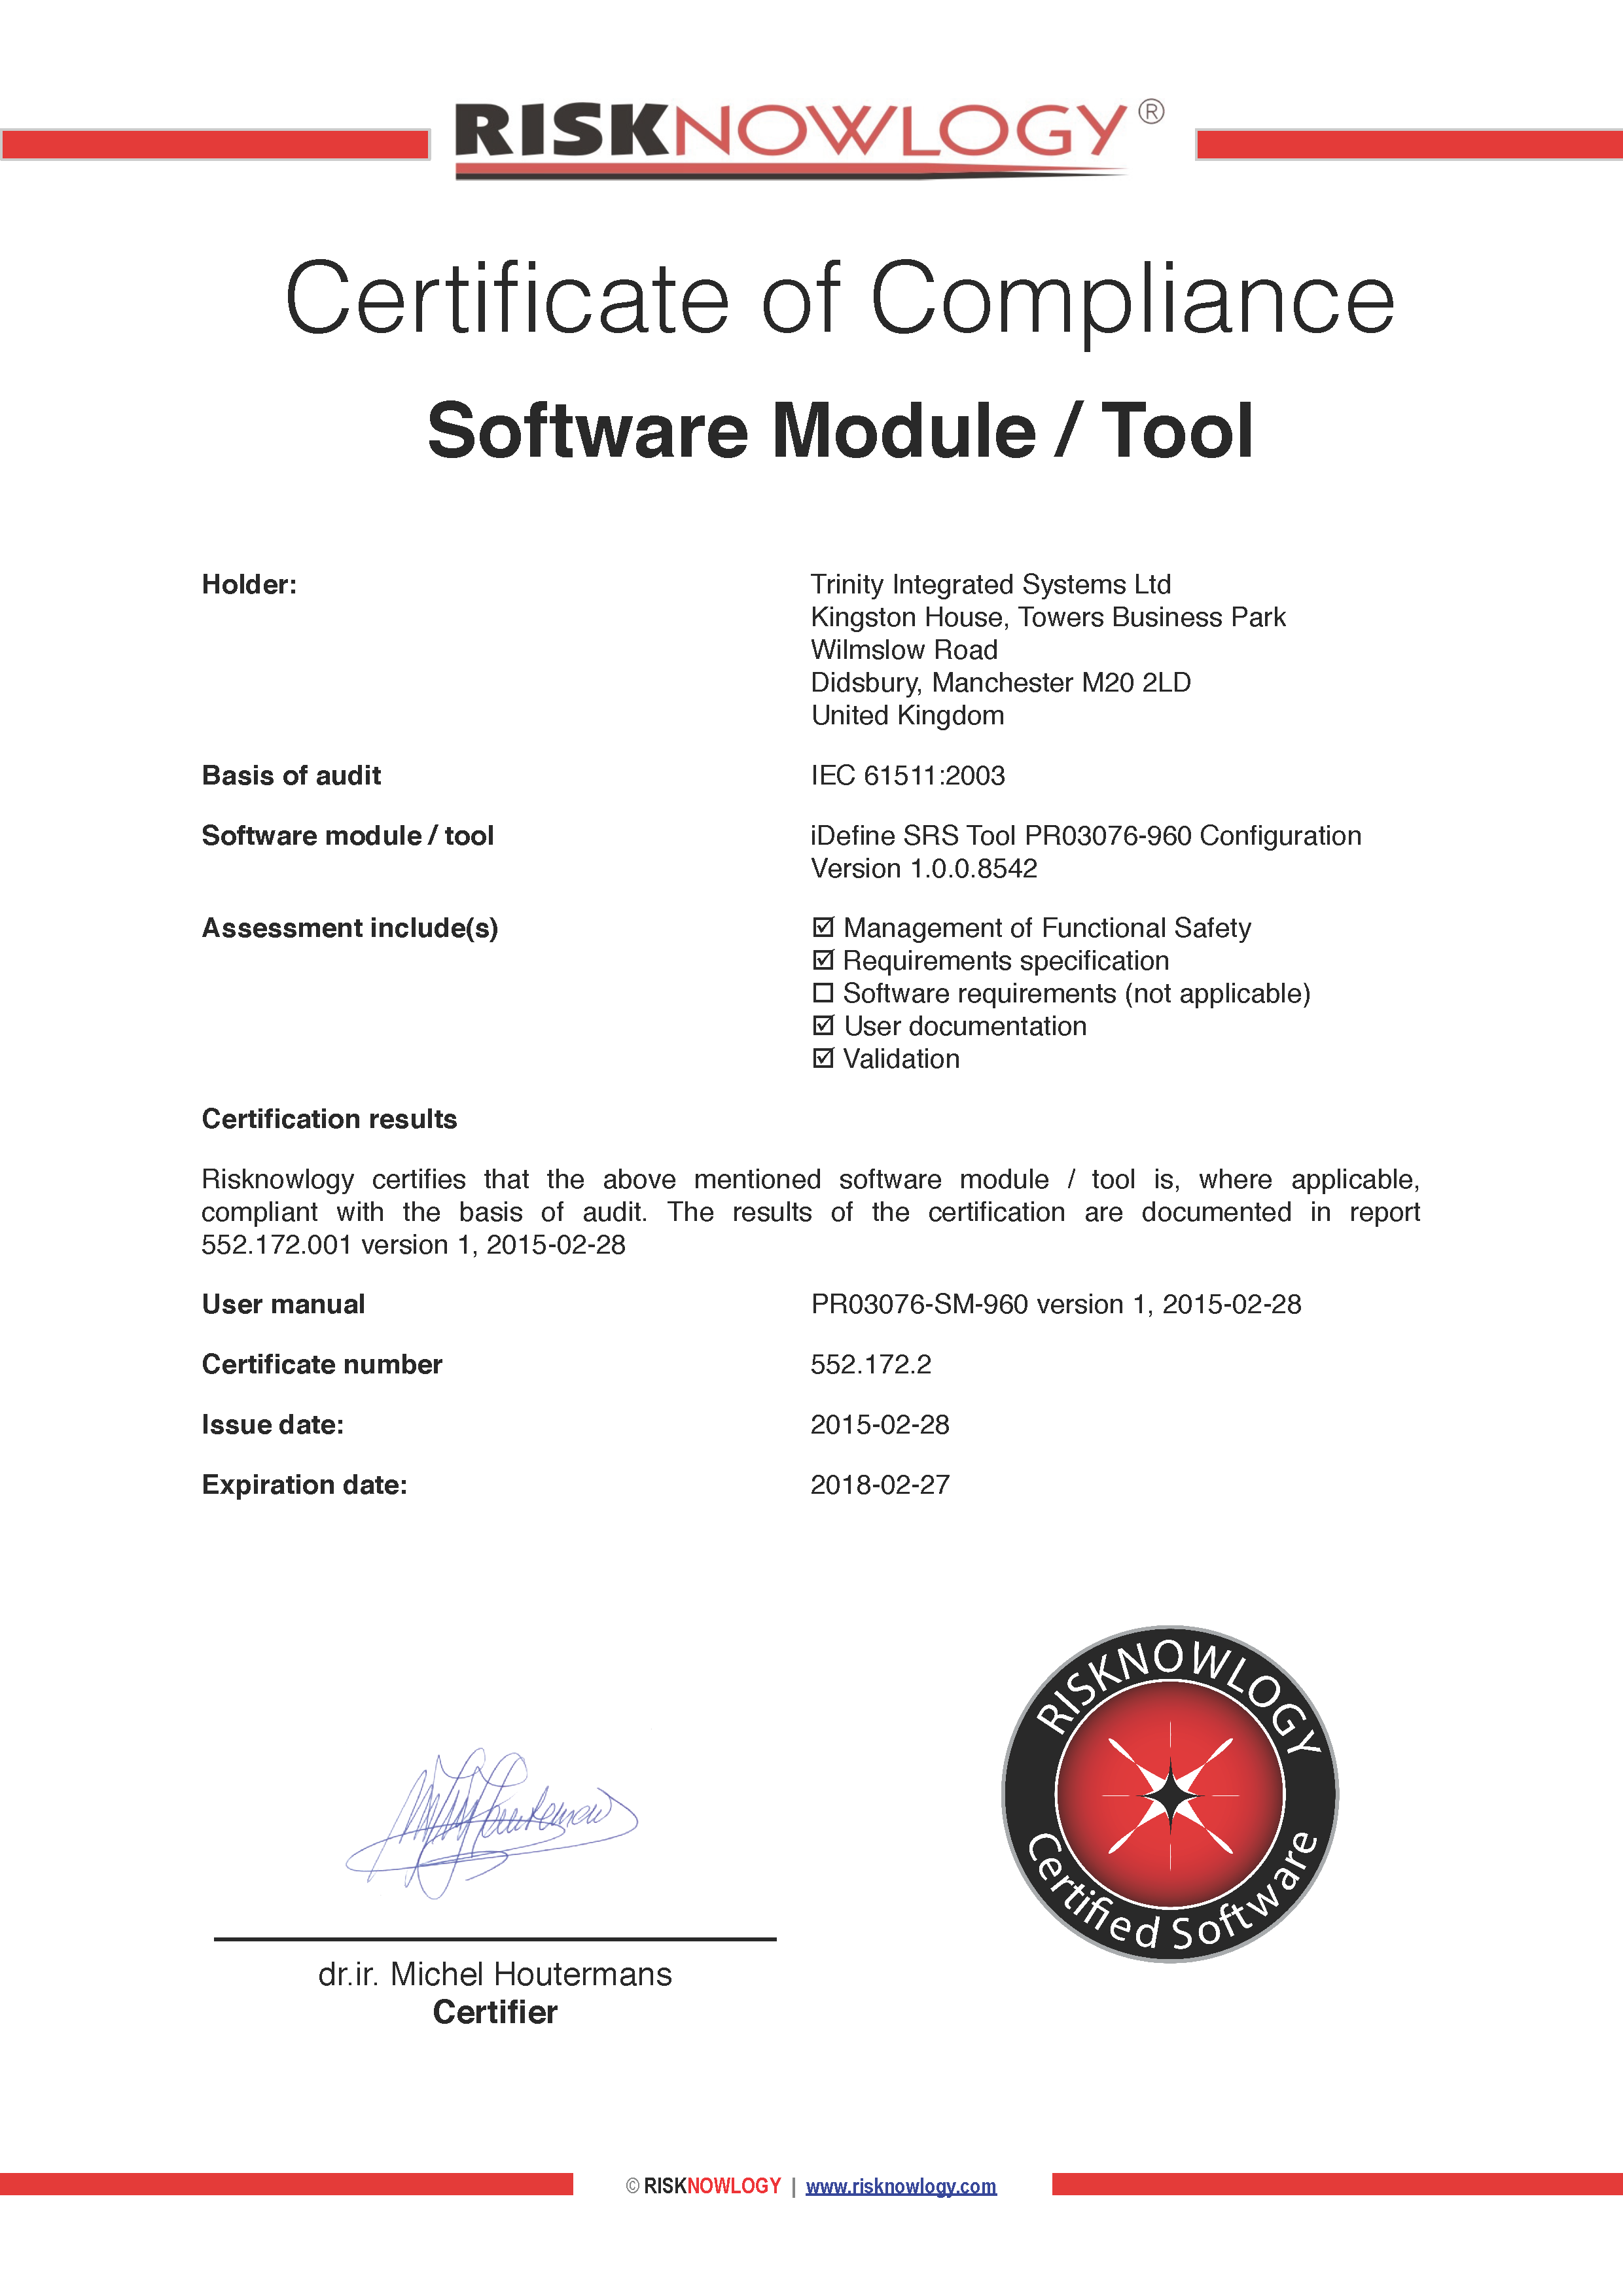 Trinity idefine srs tool risknowlogy srs tool certificate 1betcityfo Choice Image